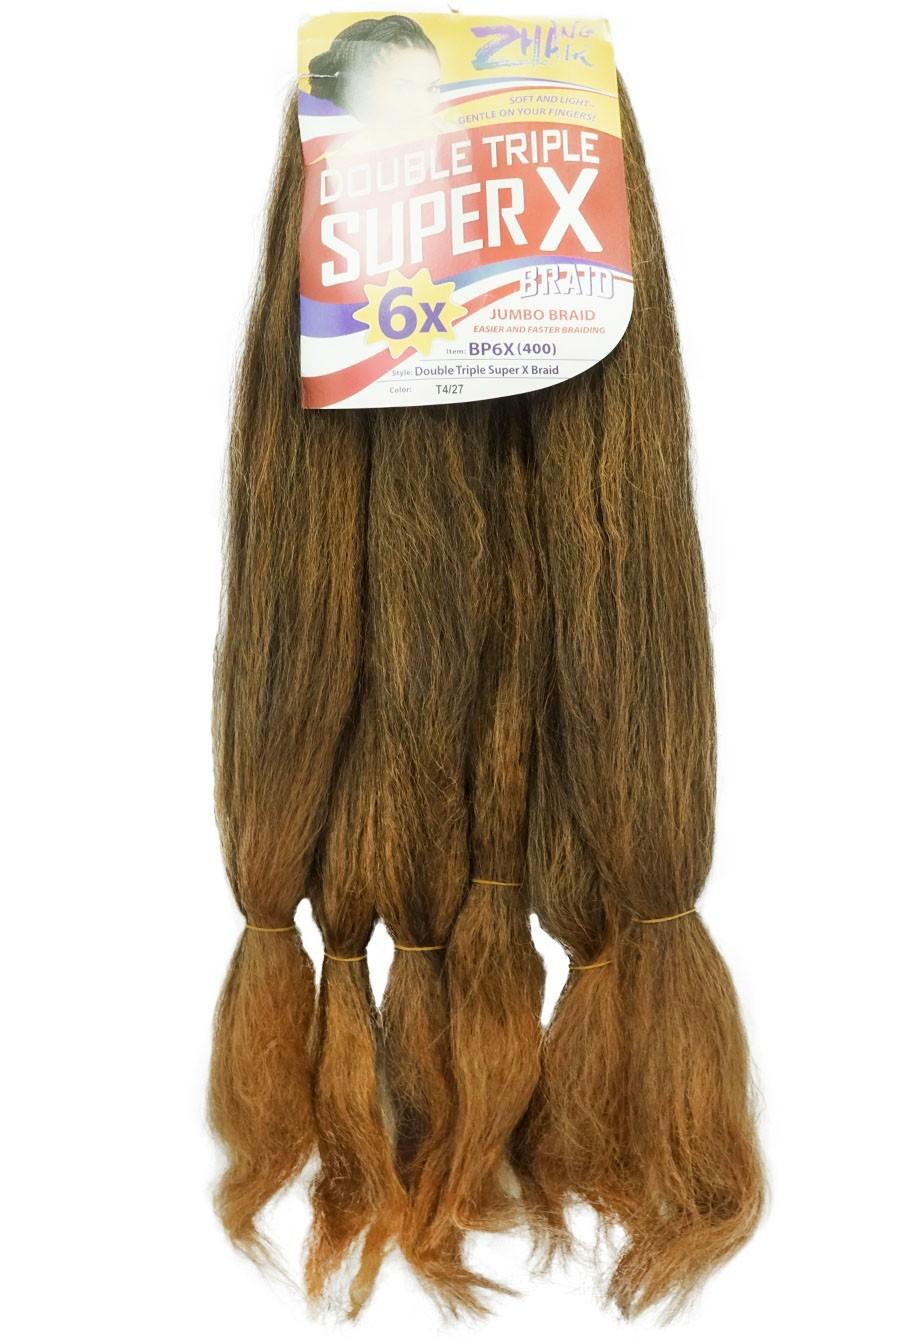 Cabelo Sintético - Zhang hair jumbo - Super X (400g) - Cor: Castanho com Mel (T4/27)